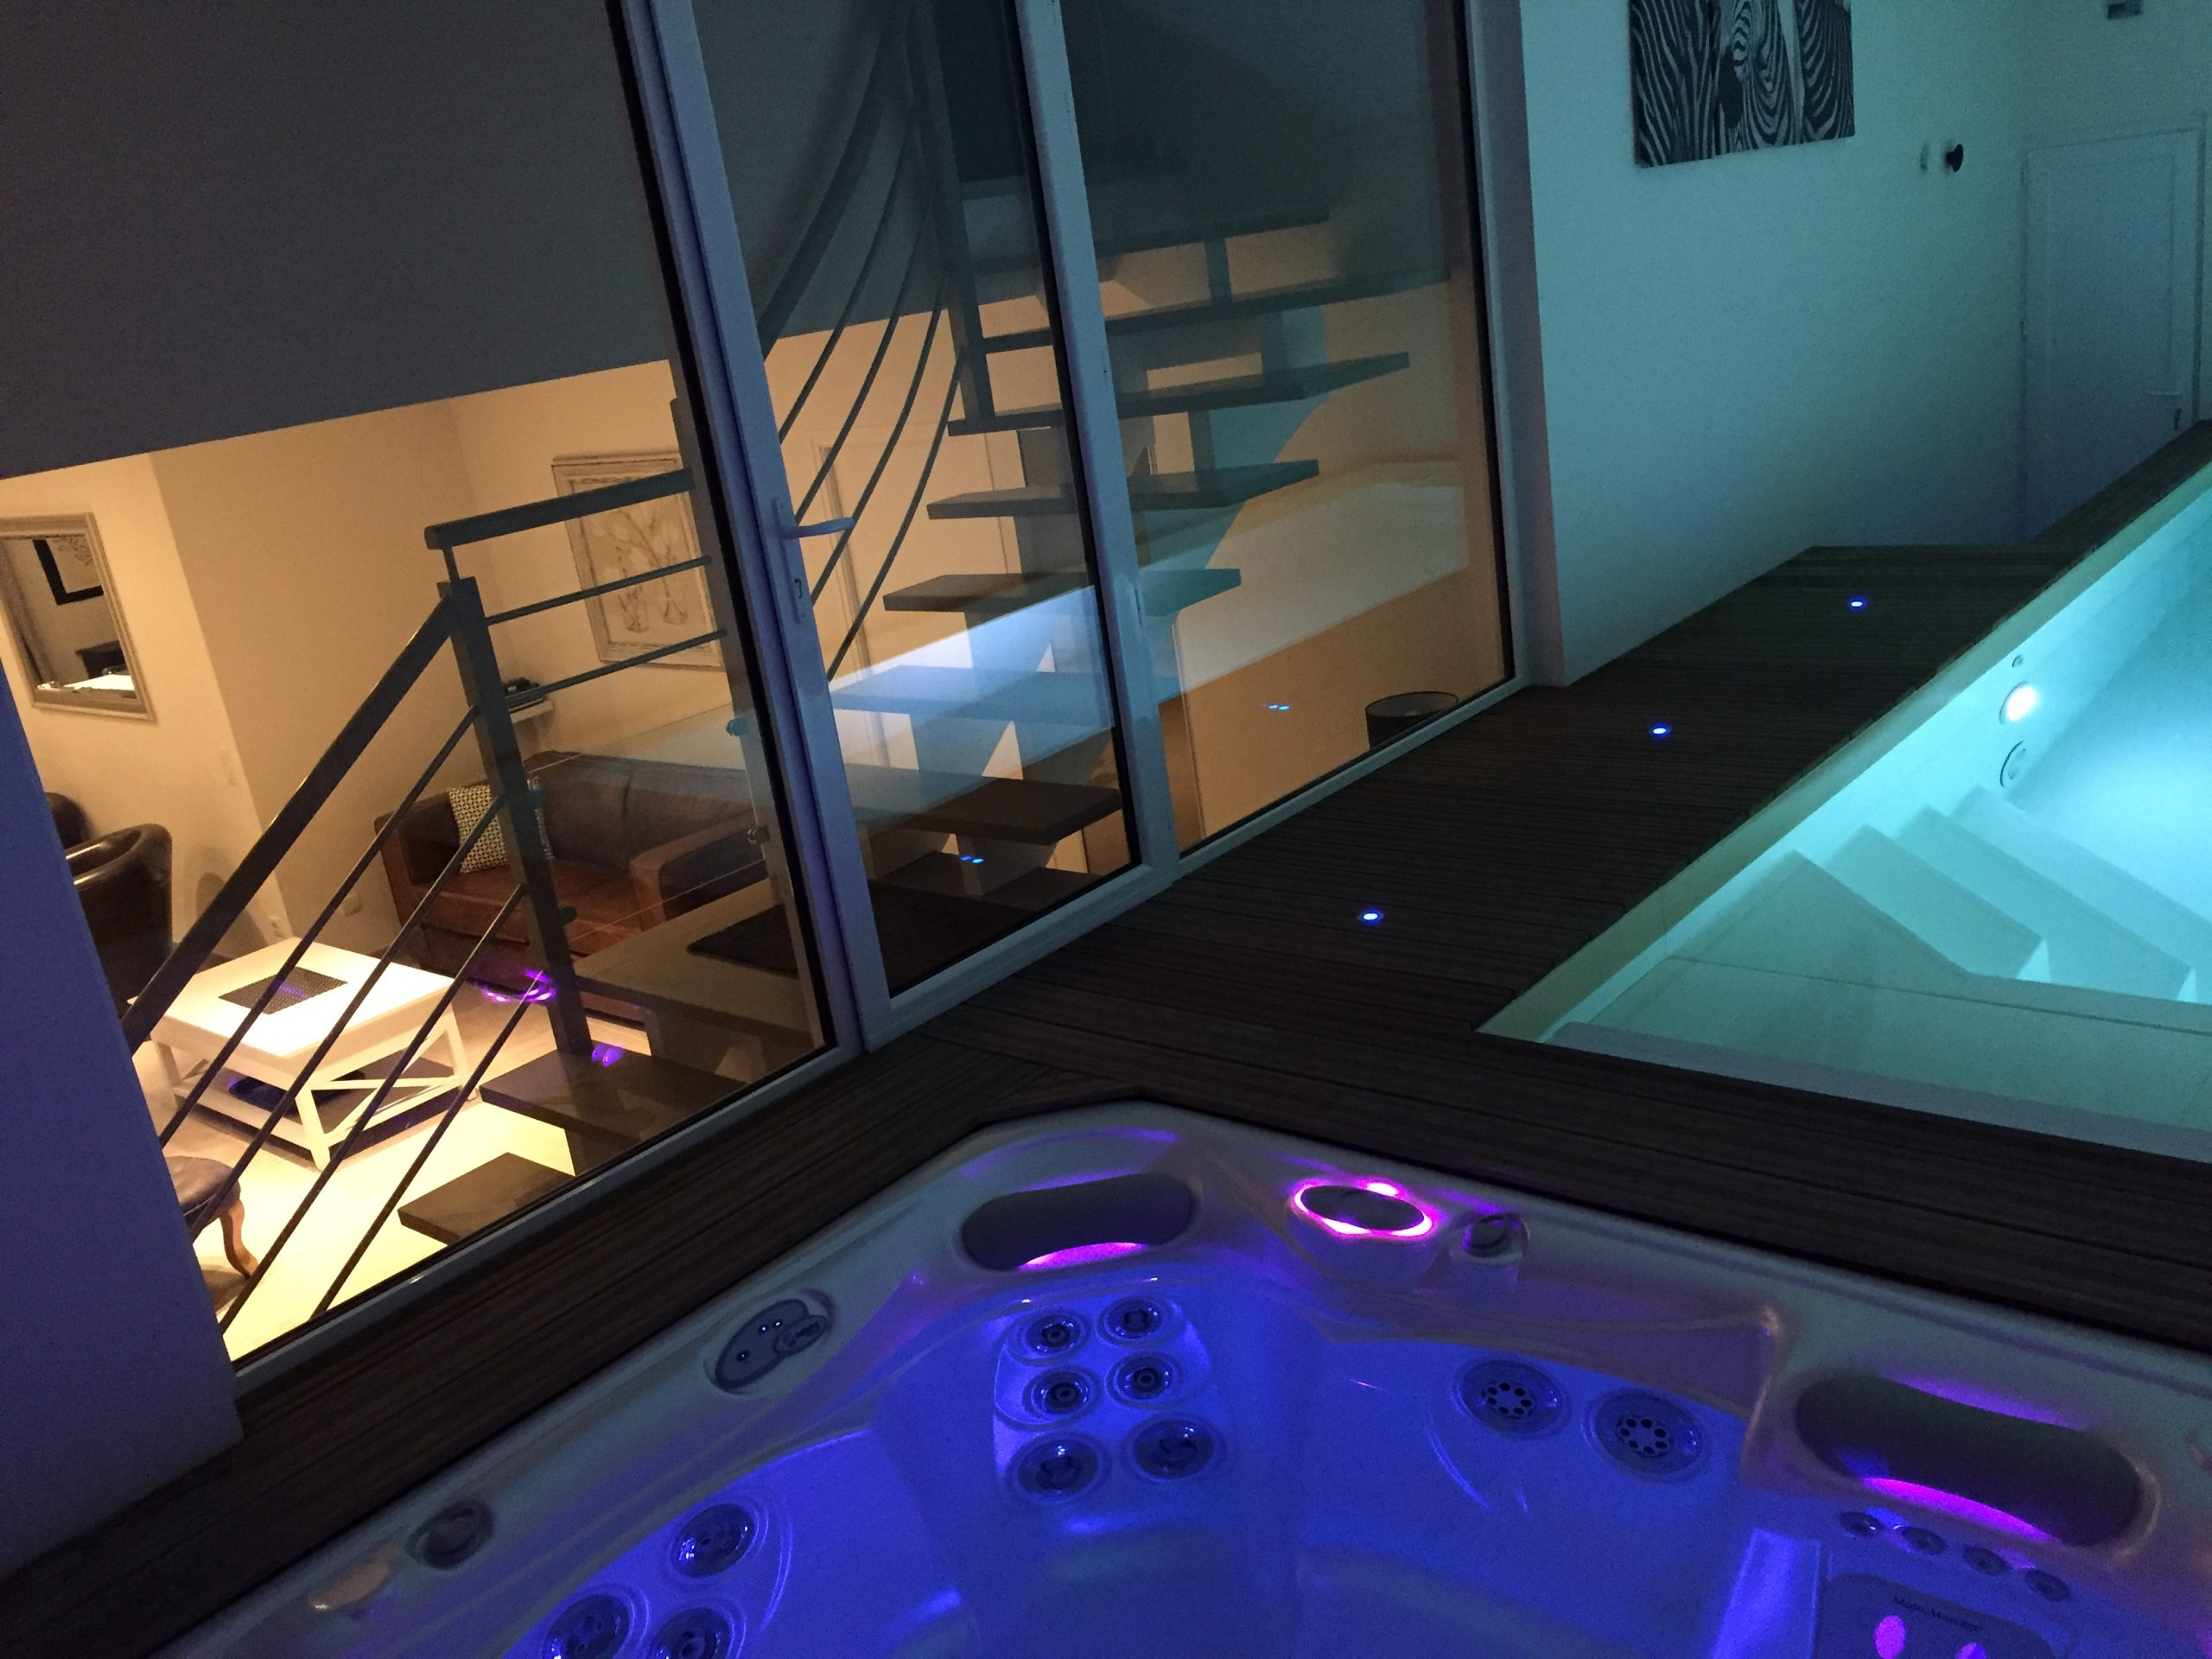 Location Villa De Vacances Avec Piscine Intérieure Et Spa intérieur Location Avec Piscine Couverte